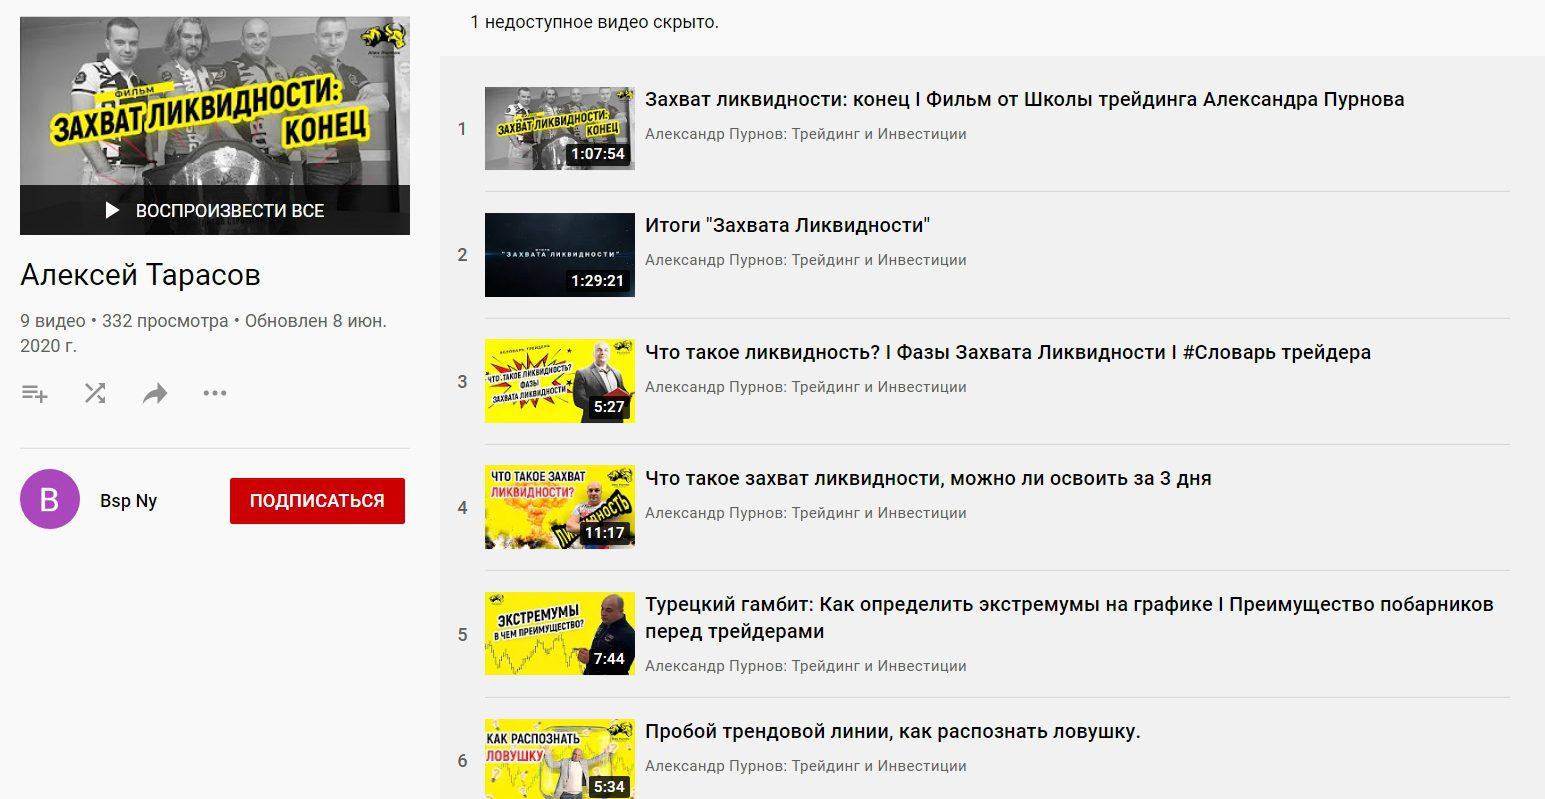 Ютуб канал Алексея Тарасова